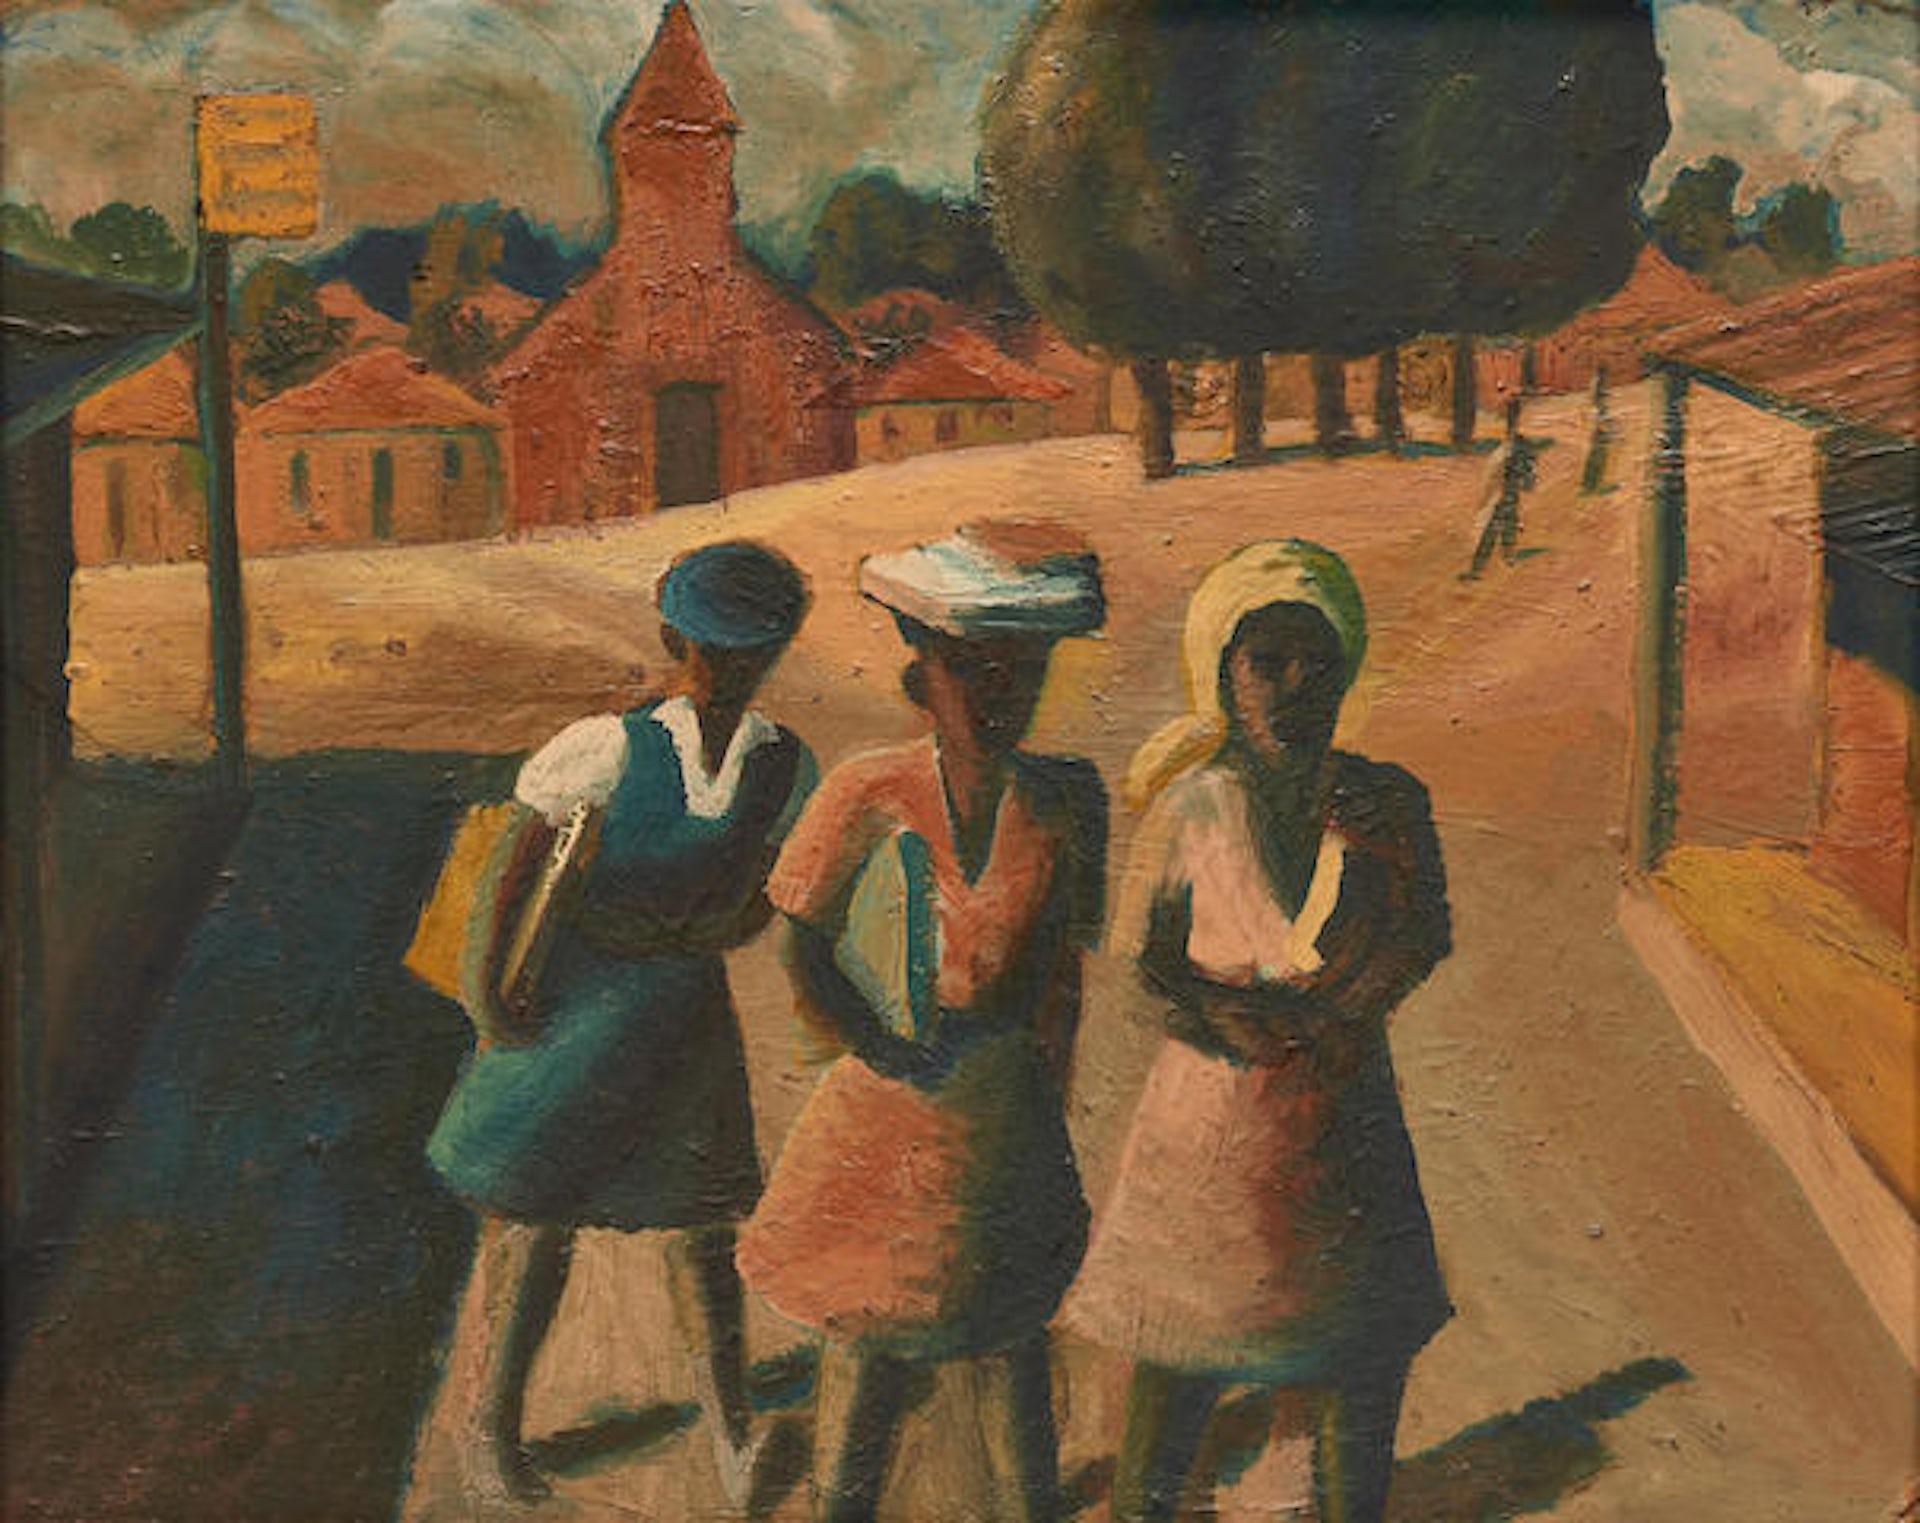 Gerard Sekoto: apartheid era tastes are still borne out at art auctions